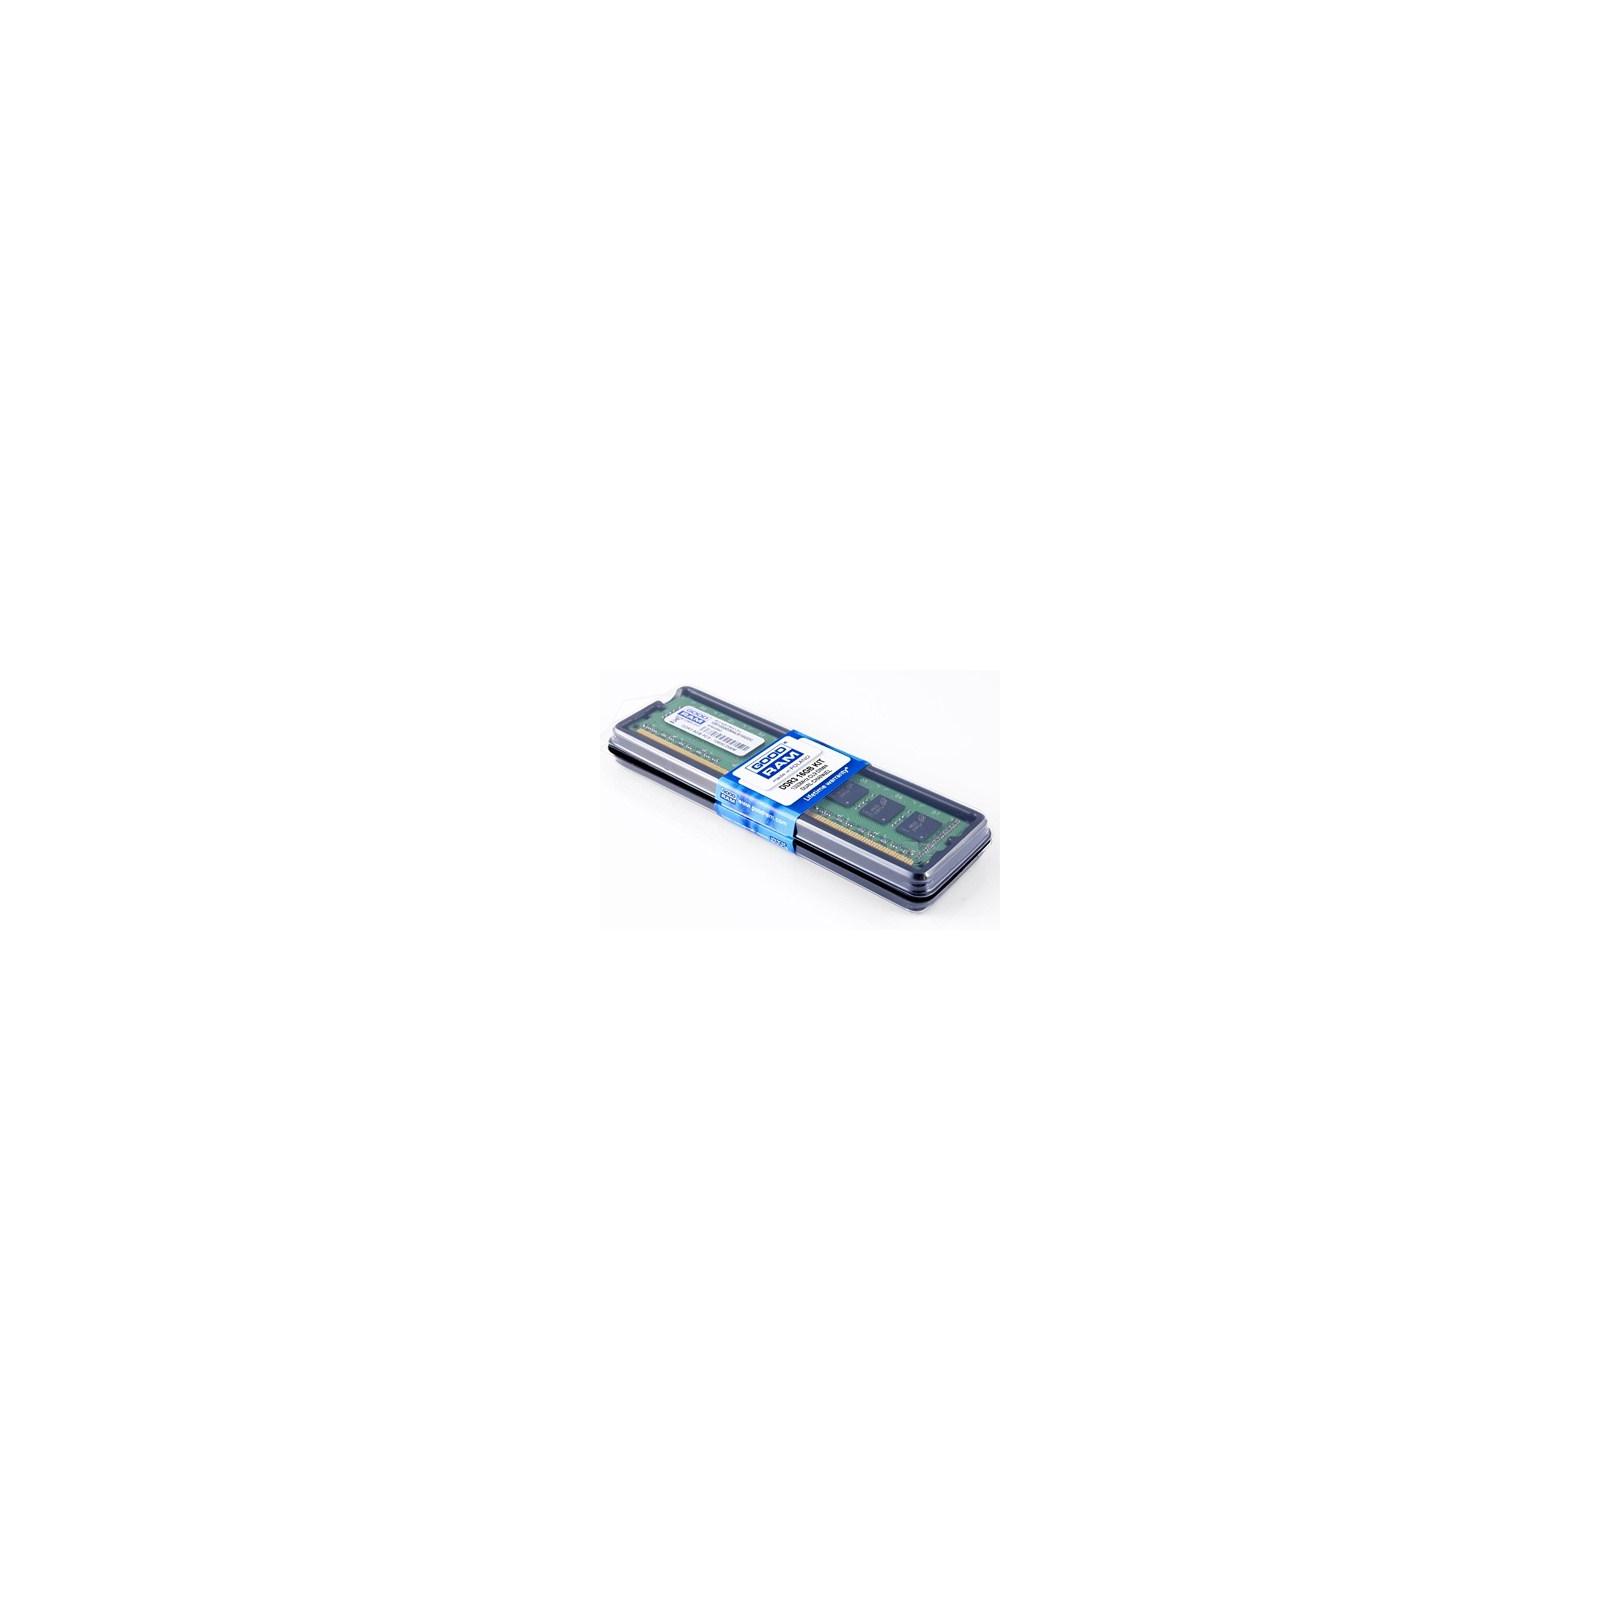 Модуль памяти для компьютера DDR3 16GB (2x8GB) 1333 MHz GOODRAM (GR1333D364L9/16GDC)